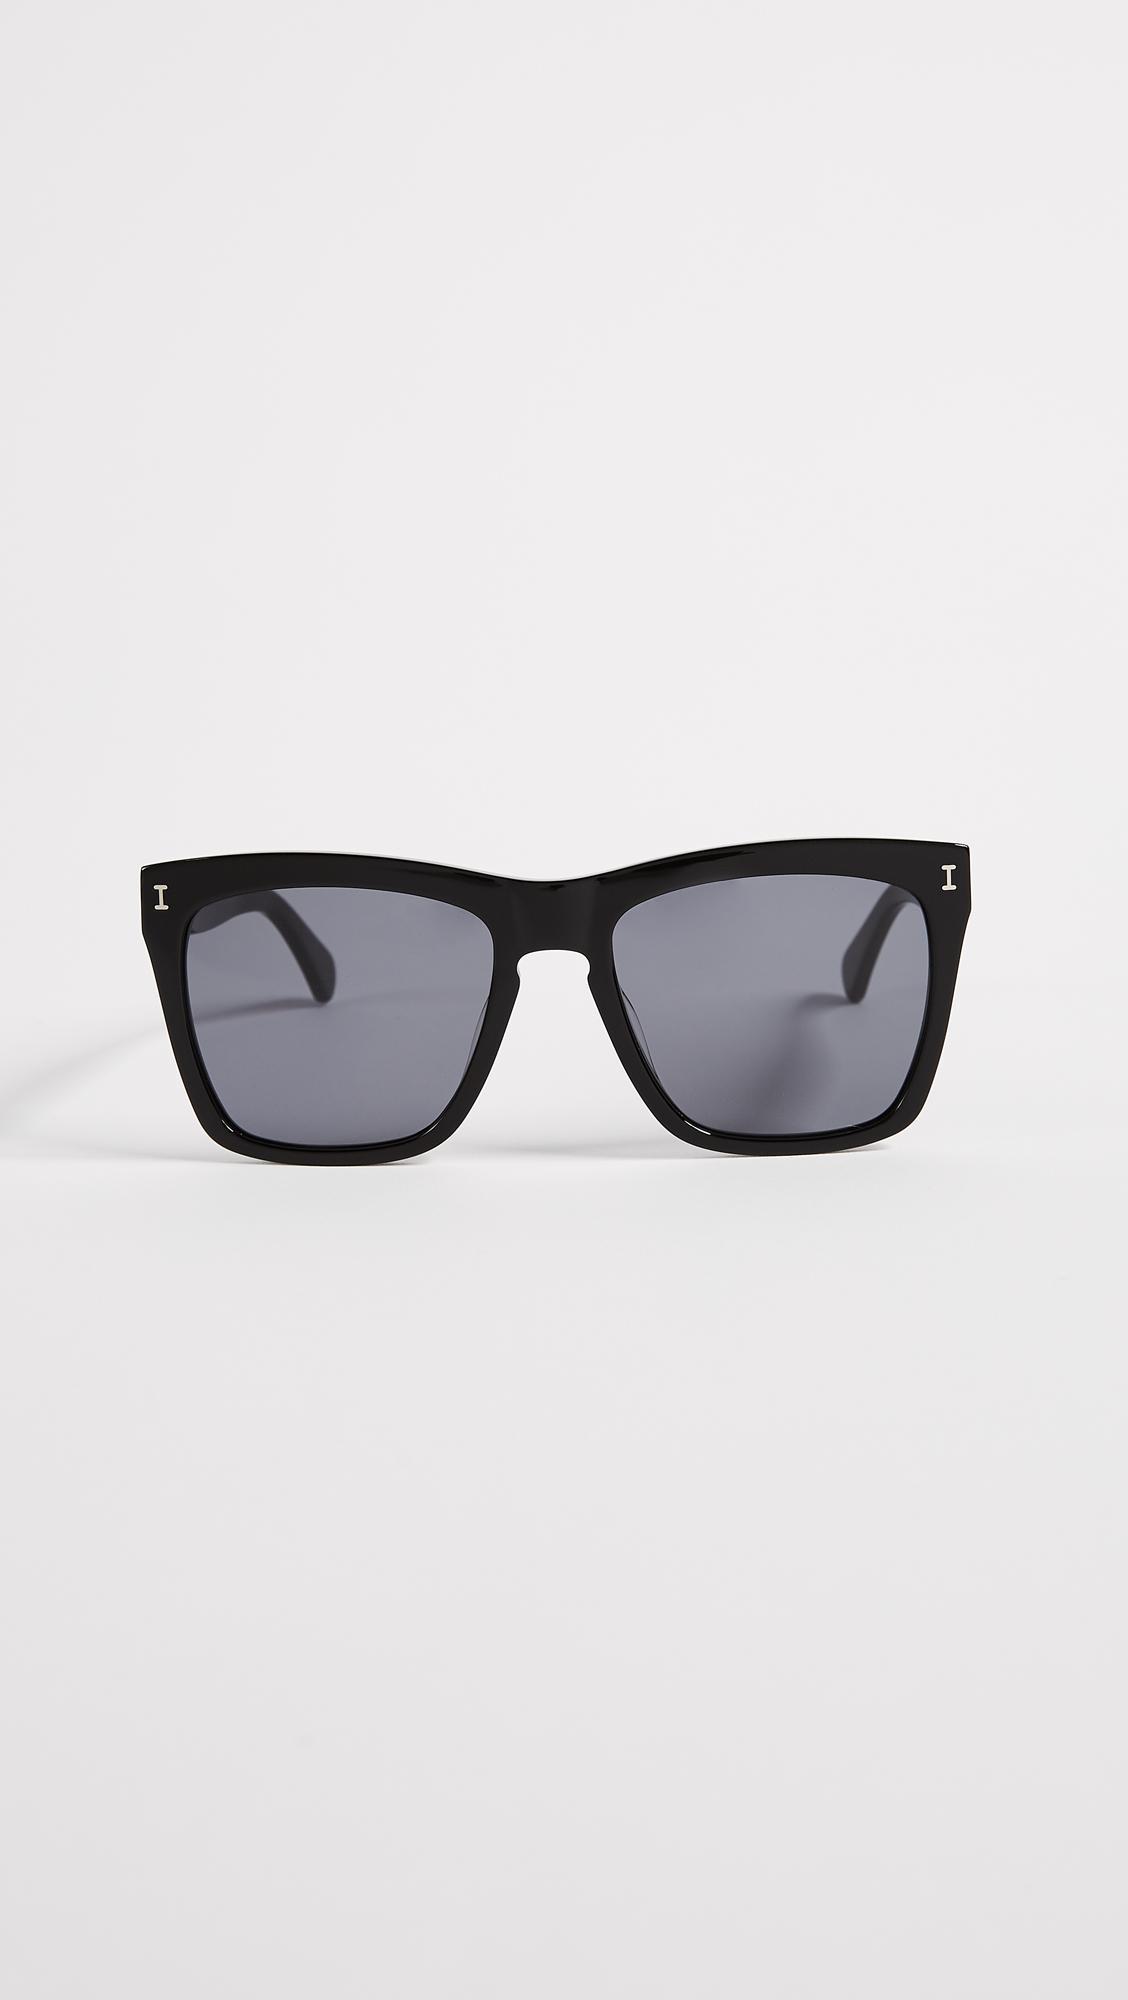 ff5a6dd18c Illesteva Los Feliz Sunglasses in Black - Lyst